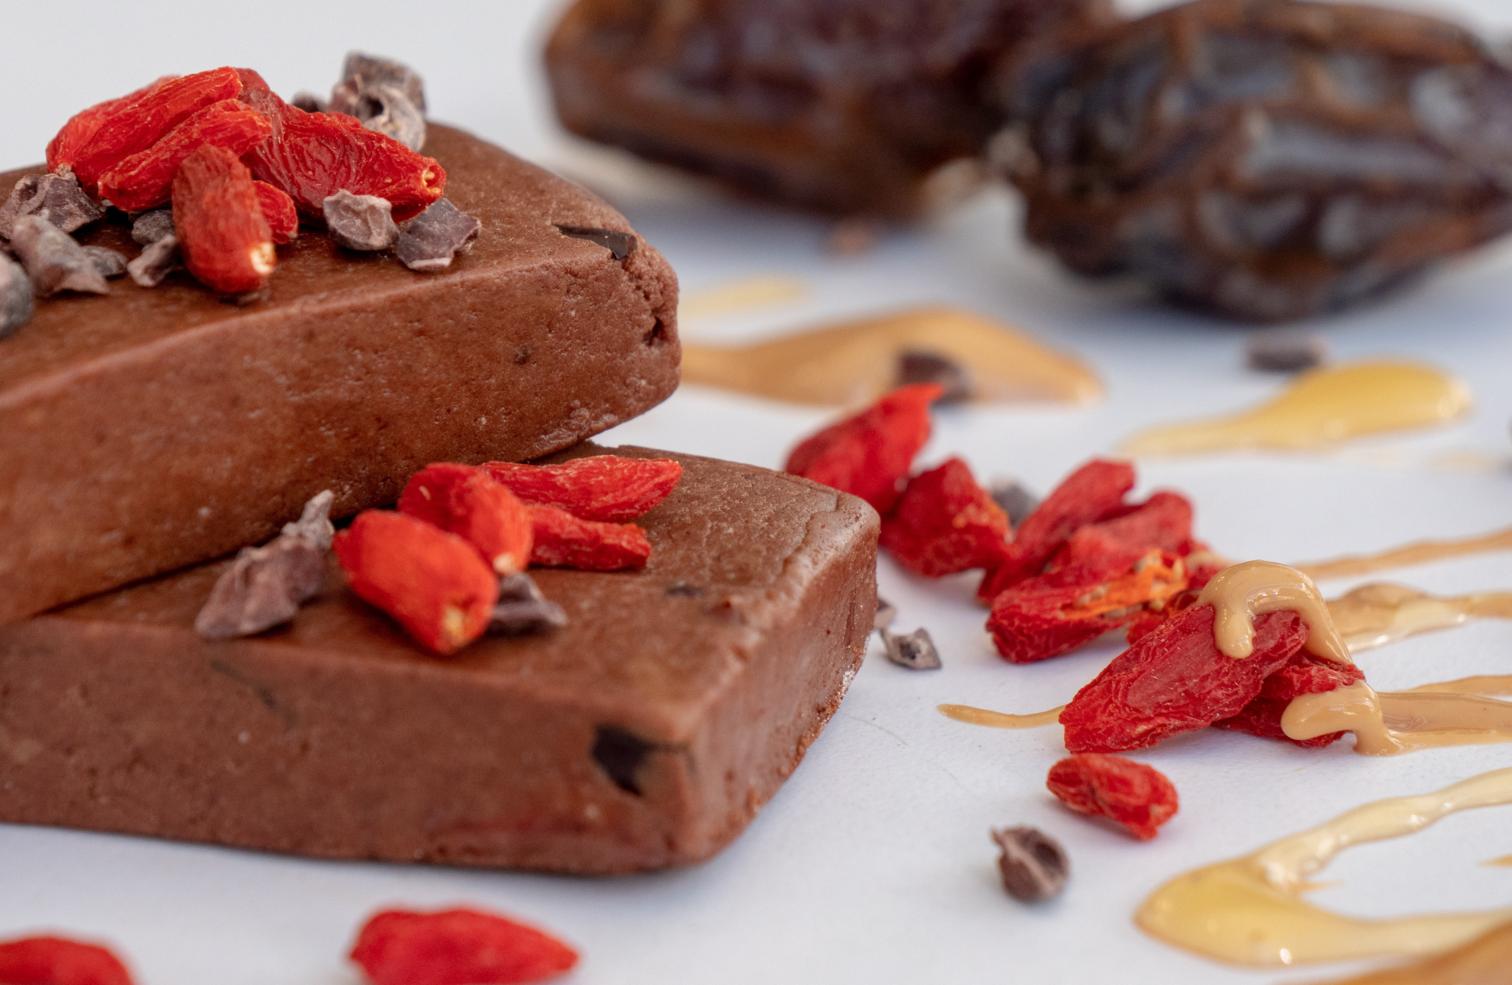 Chocolate Goji Berry Ingredients